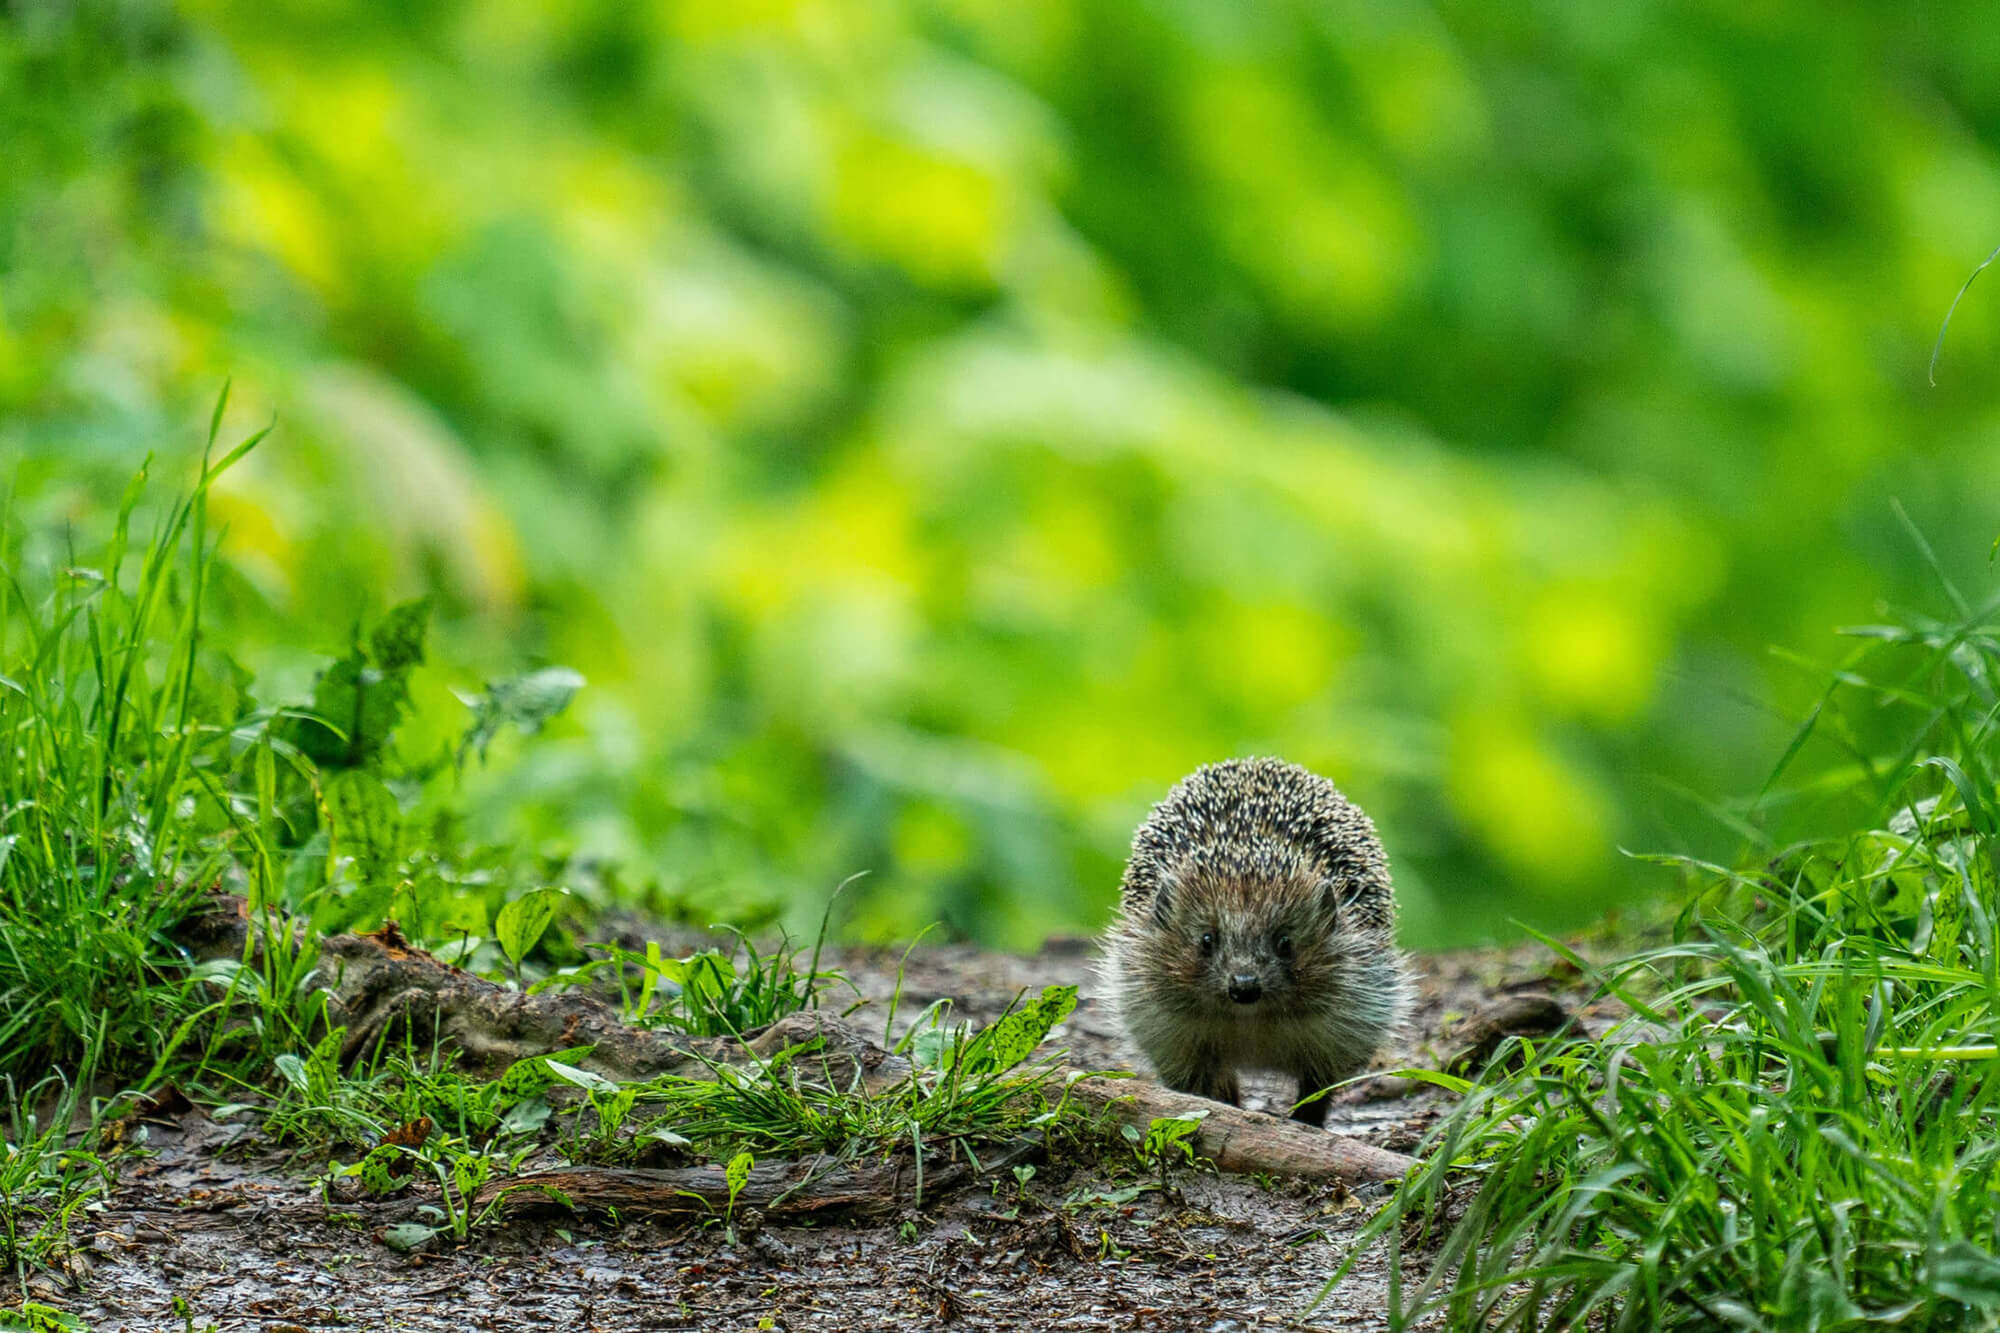 Hedgehog amongst grass